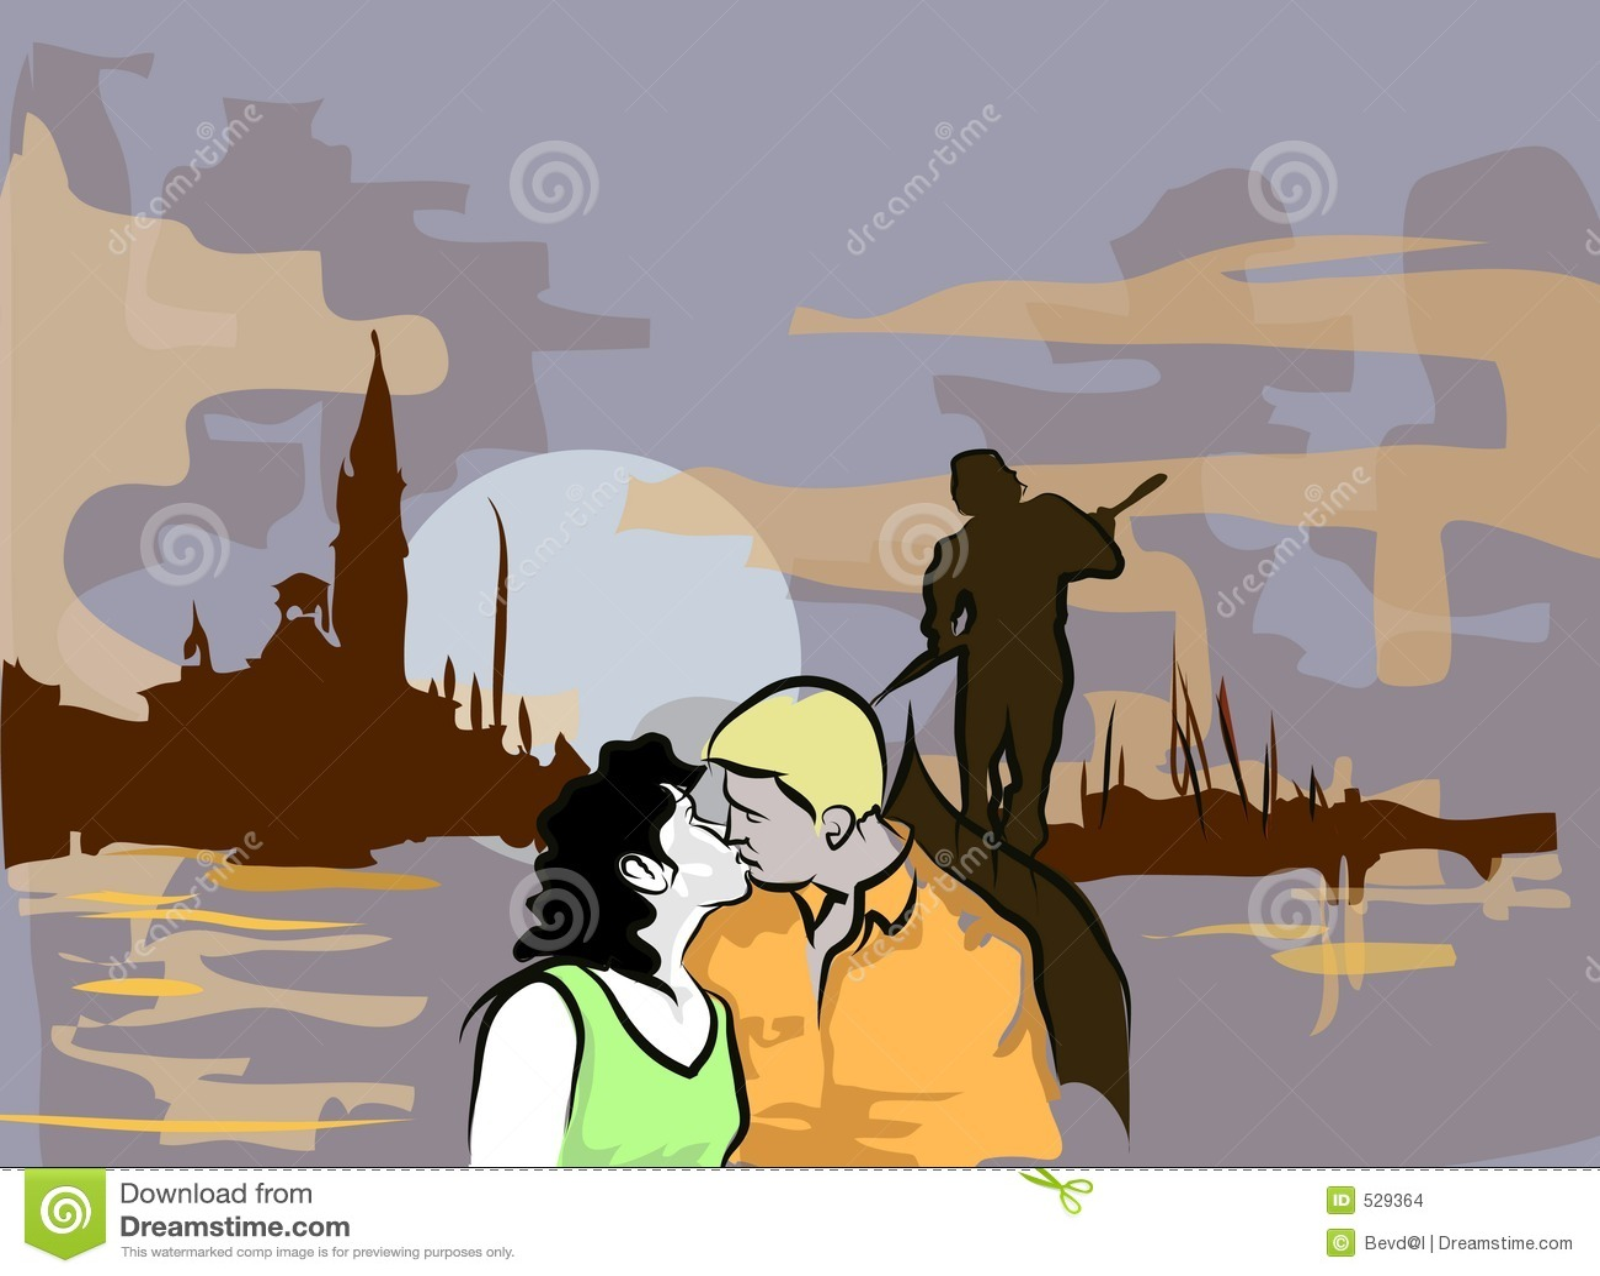 Download 浪漫的晚上 库存例证. 插画 包括有 明信片, 意大利语, 小船, 金黄, 嘴唇, 黄昏, 爱慕, 运河, 新郎 - 529364